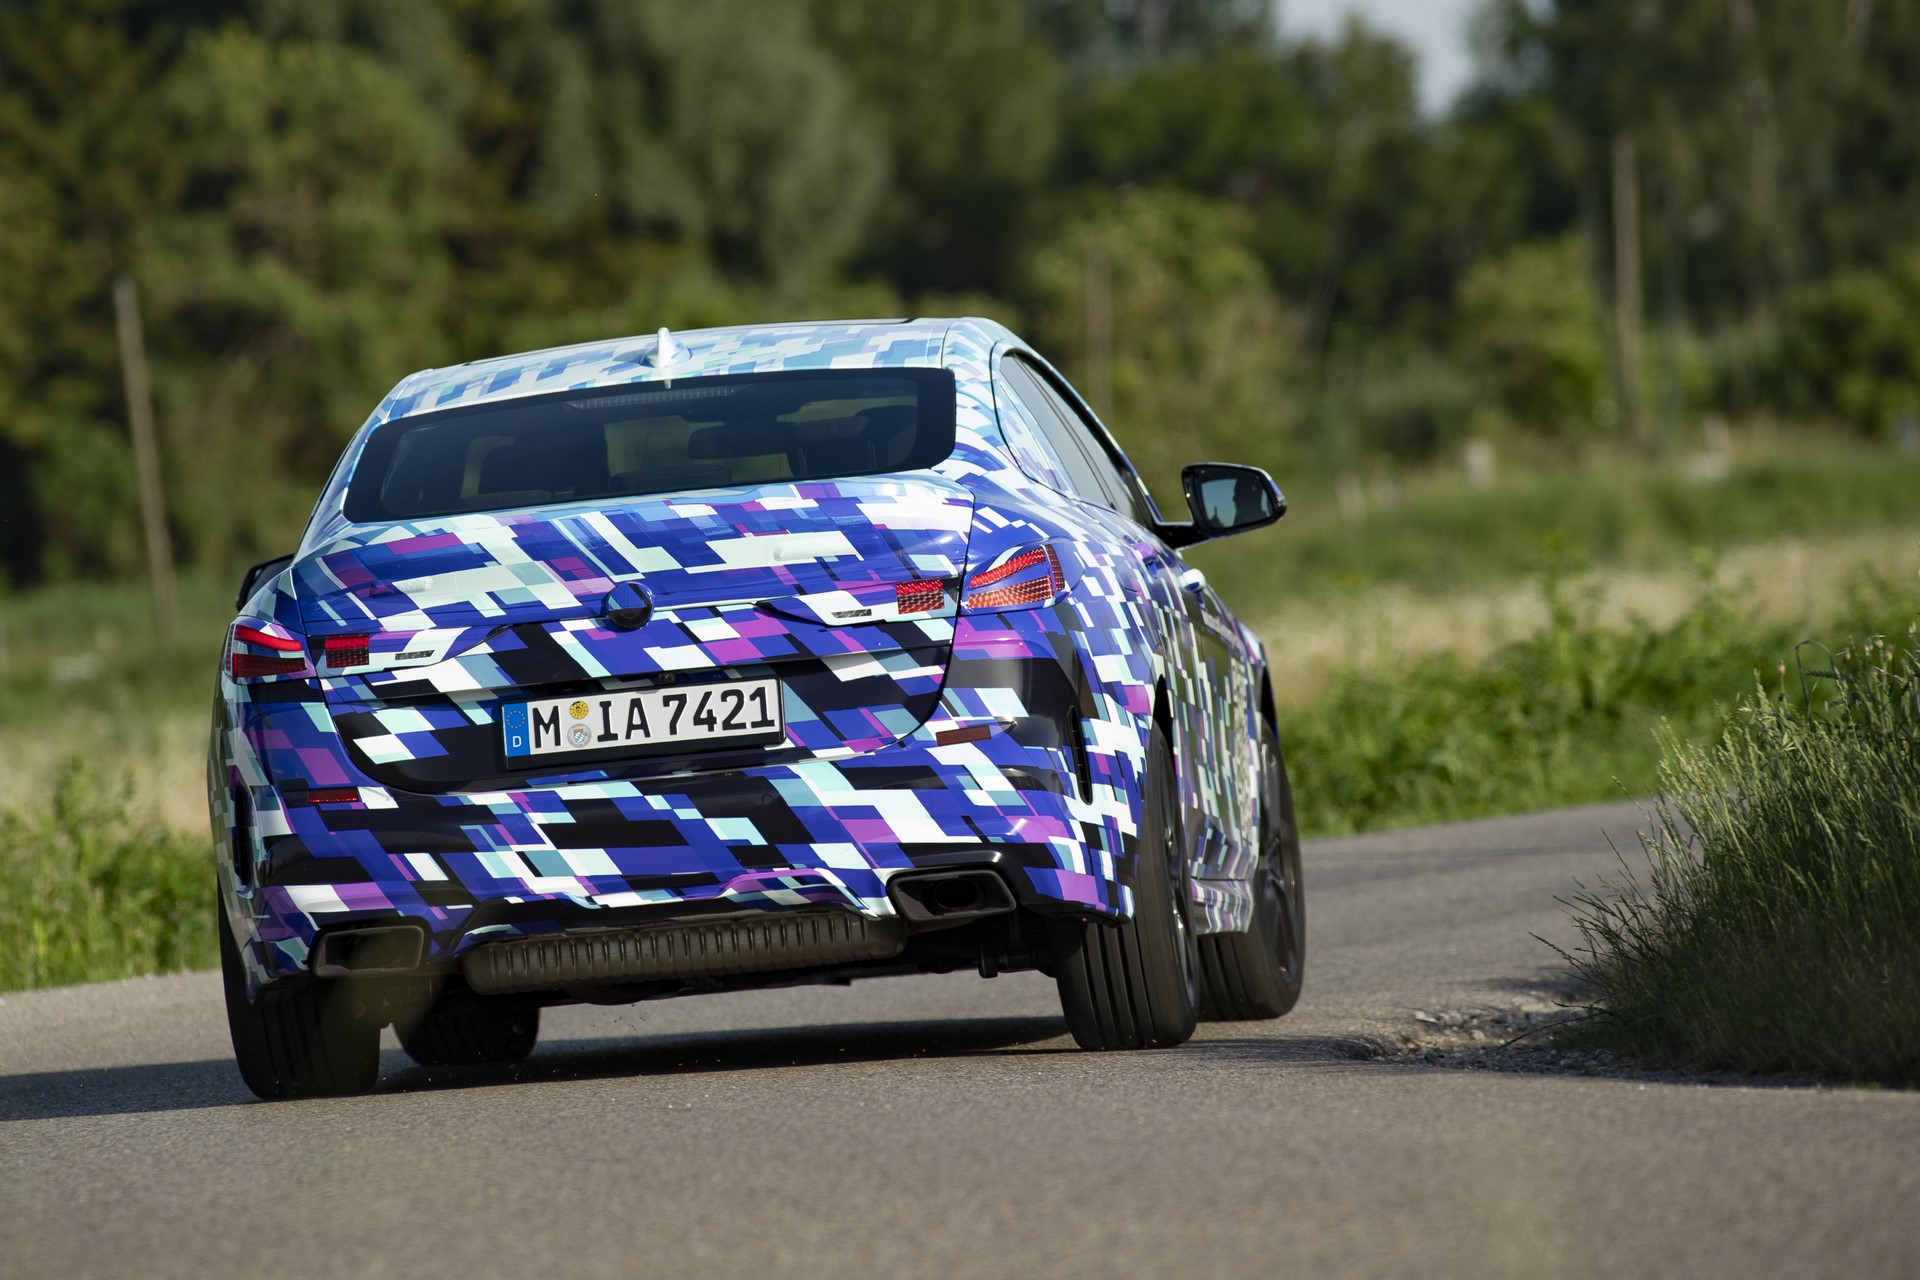 BMW-2-Series-Gran-Coupe-2020-spy-photos-6